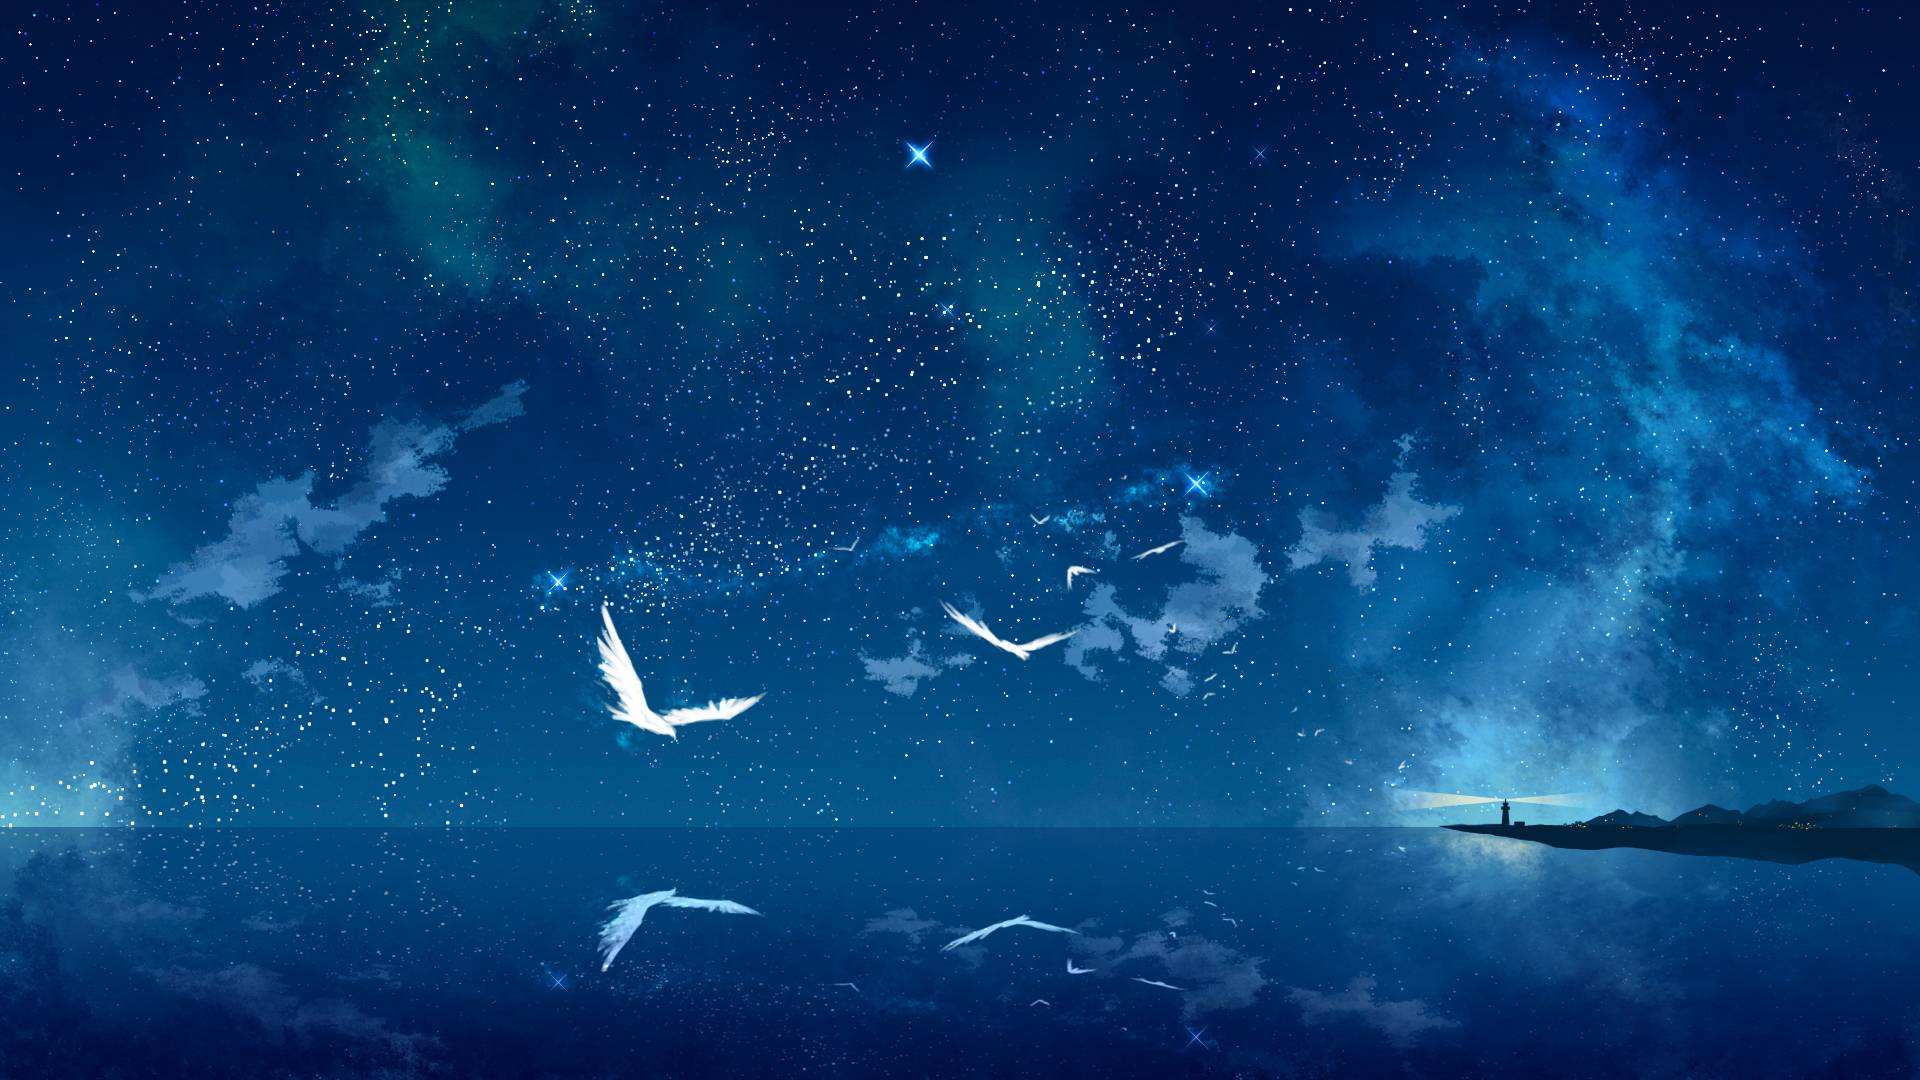 Anime Night Sky wallpaper   1135536 1920x1080